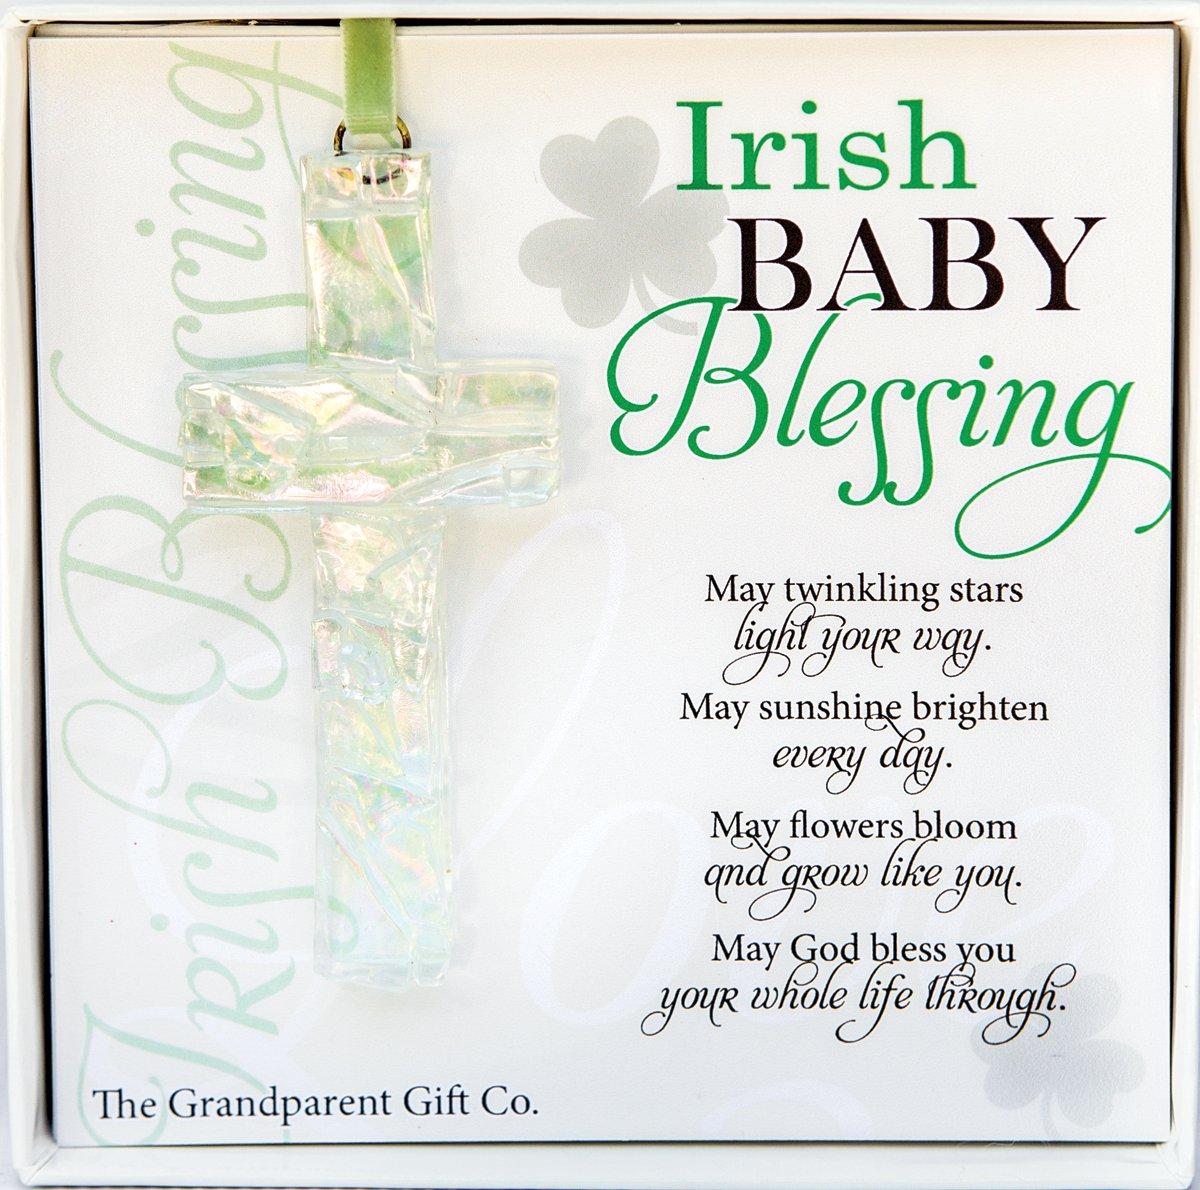 Infant Bedtime Blessing Irish Celtic Print by ...  Irish Baby Blessing